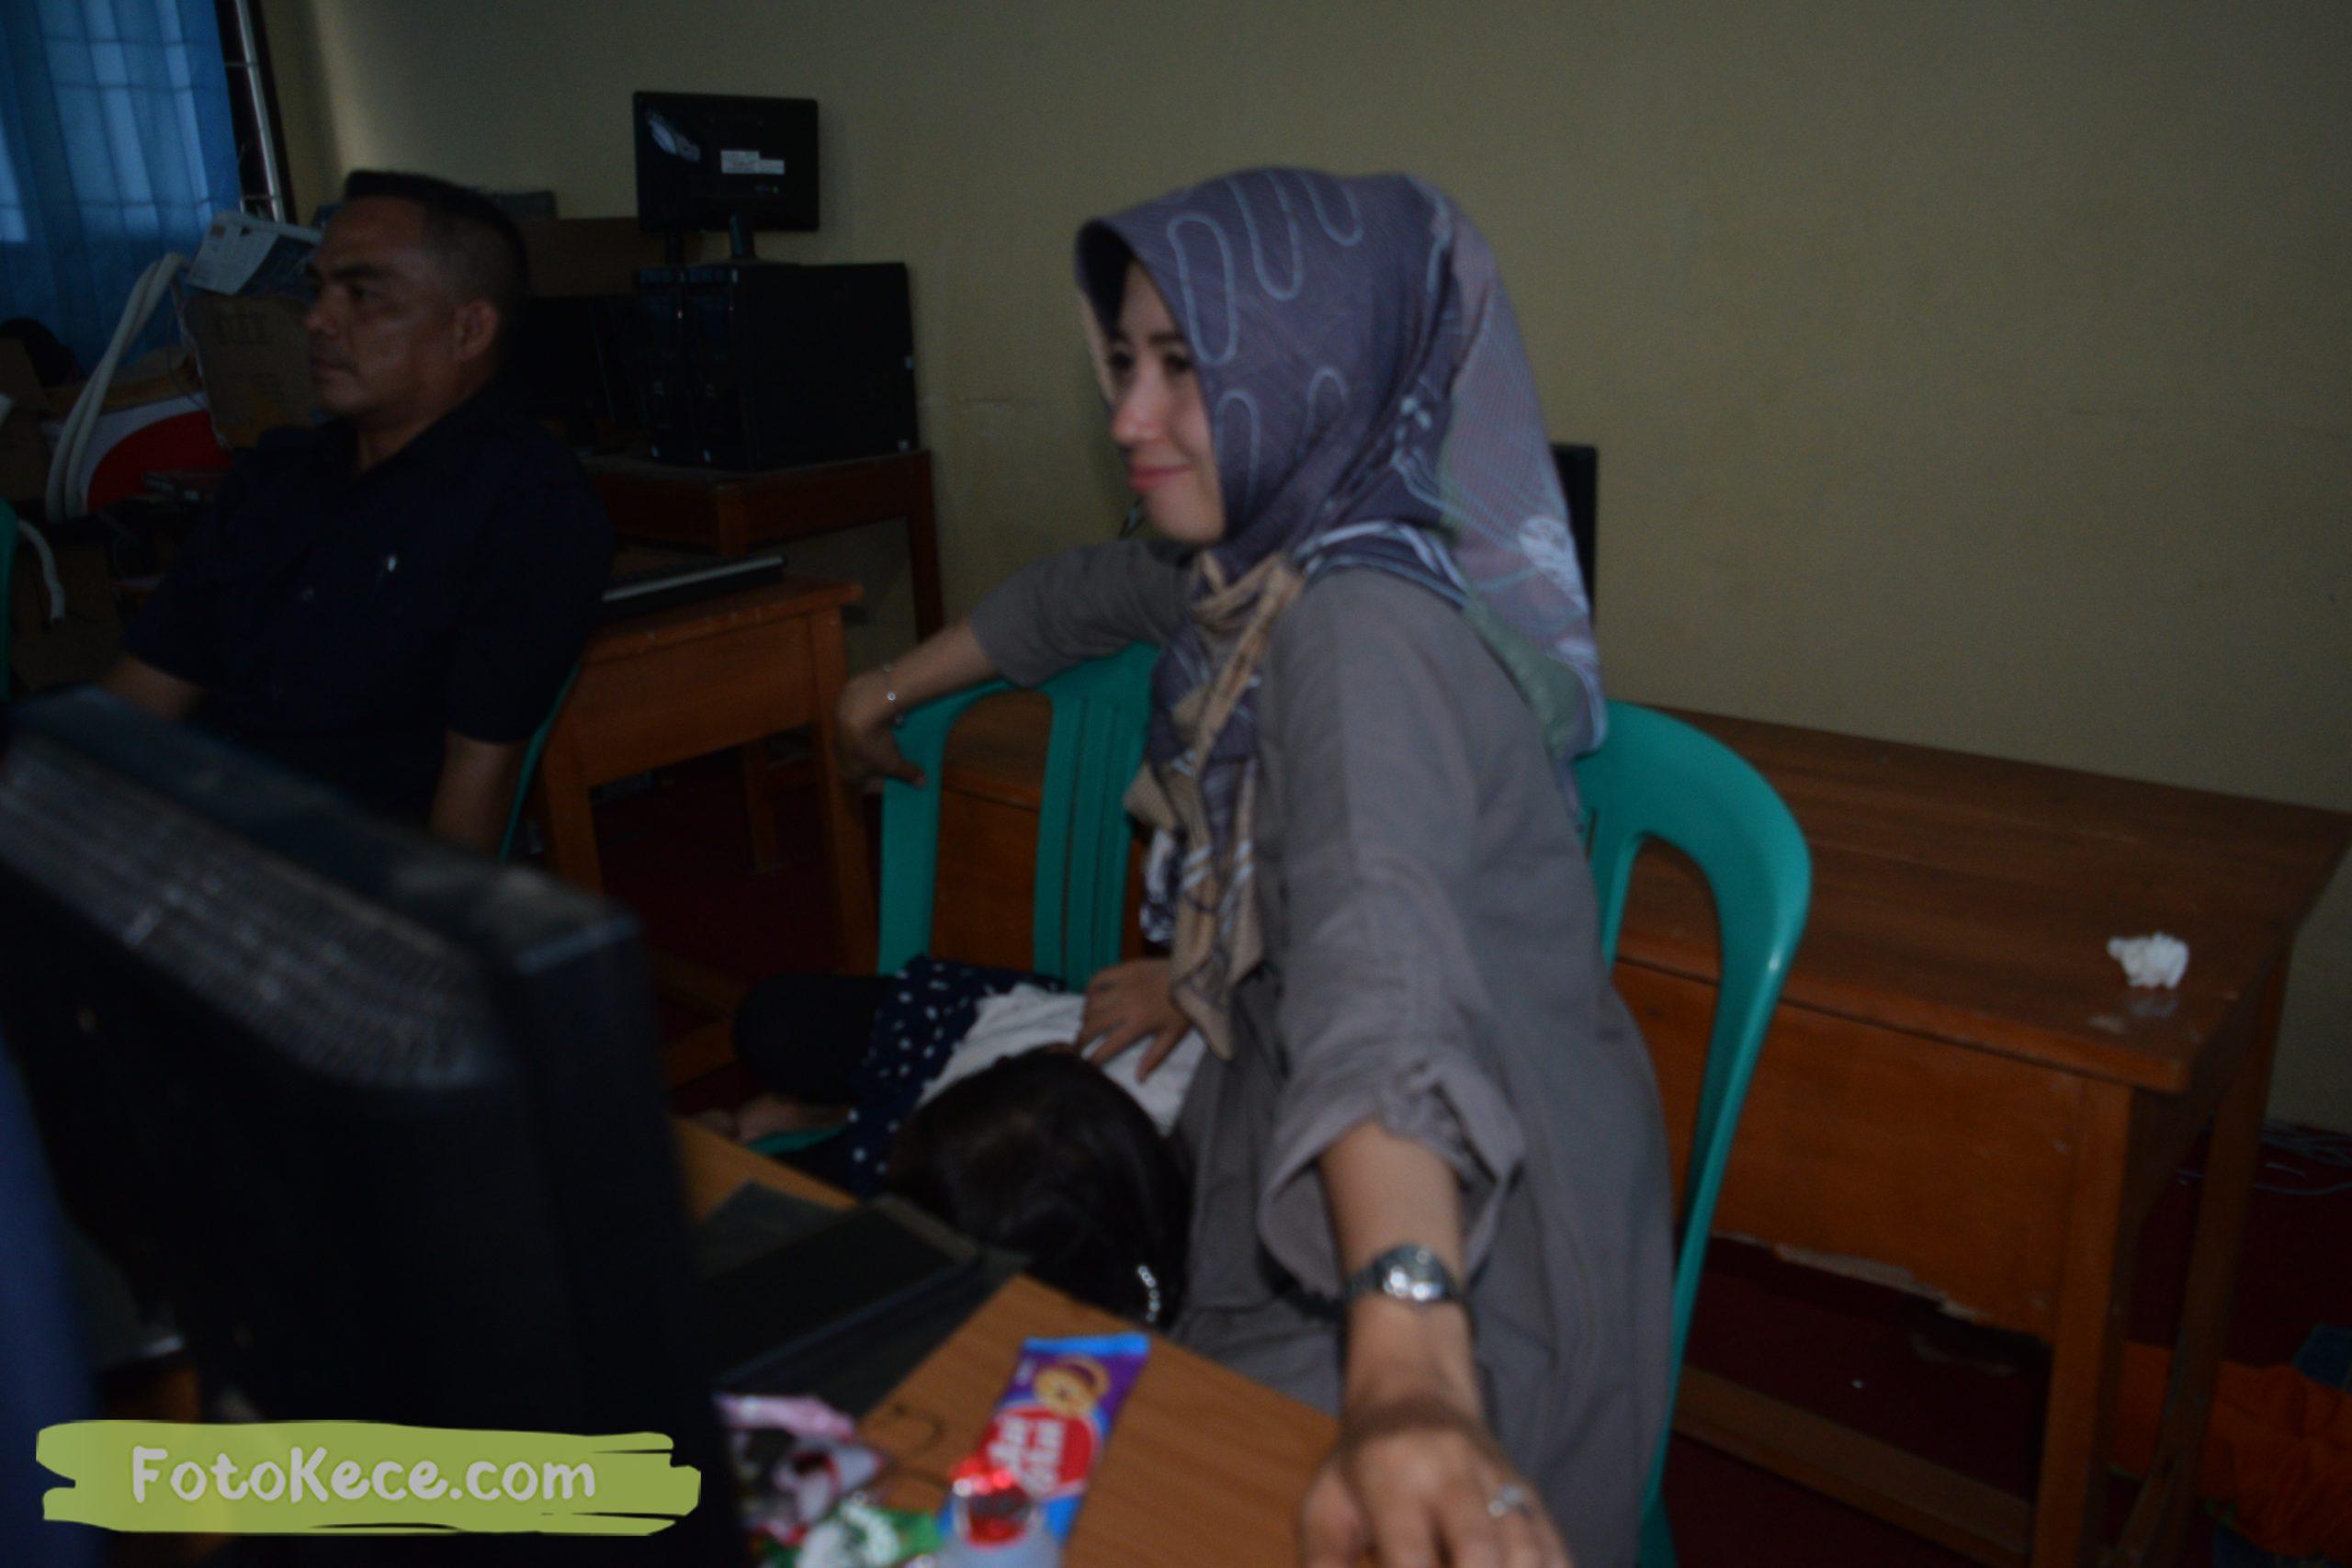 bimbingan teknis sieka 2020 bersama Bpk Abdul Aziz 08012020 fotokece 42 scaled